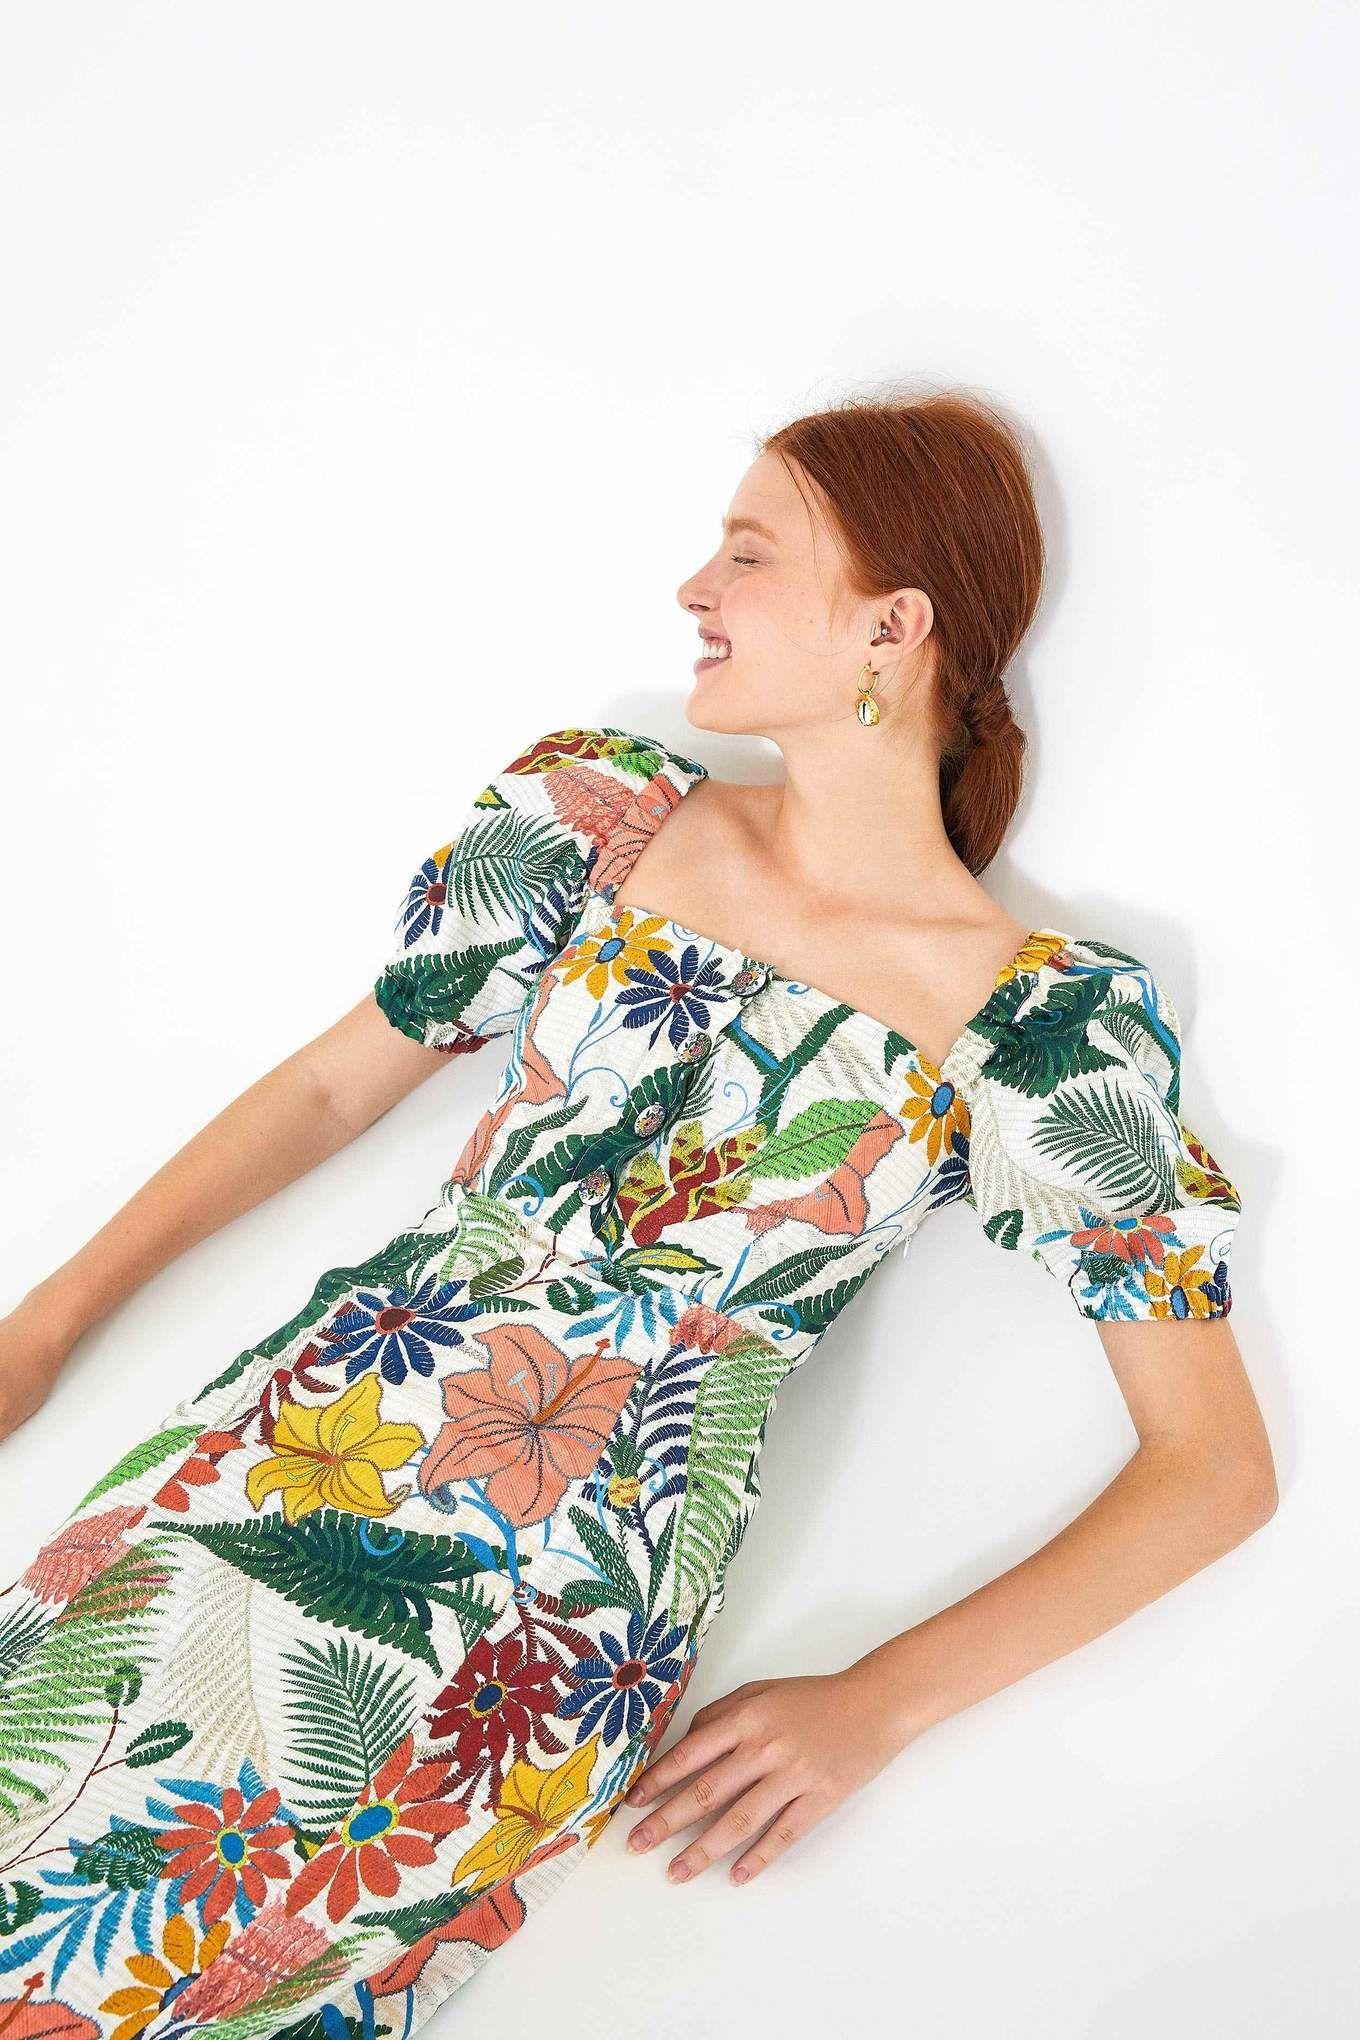 Vintage Garden Puffed Sleeves Midi Dress Farm Rio Puff Sleeve Midi Dresses Midi Dress With Sleeves White Vintage Dress